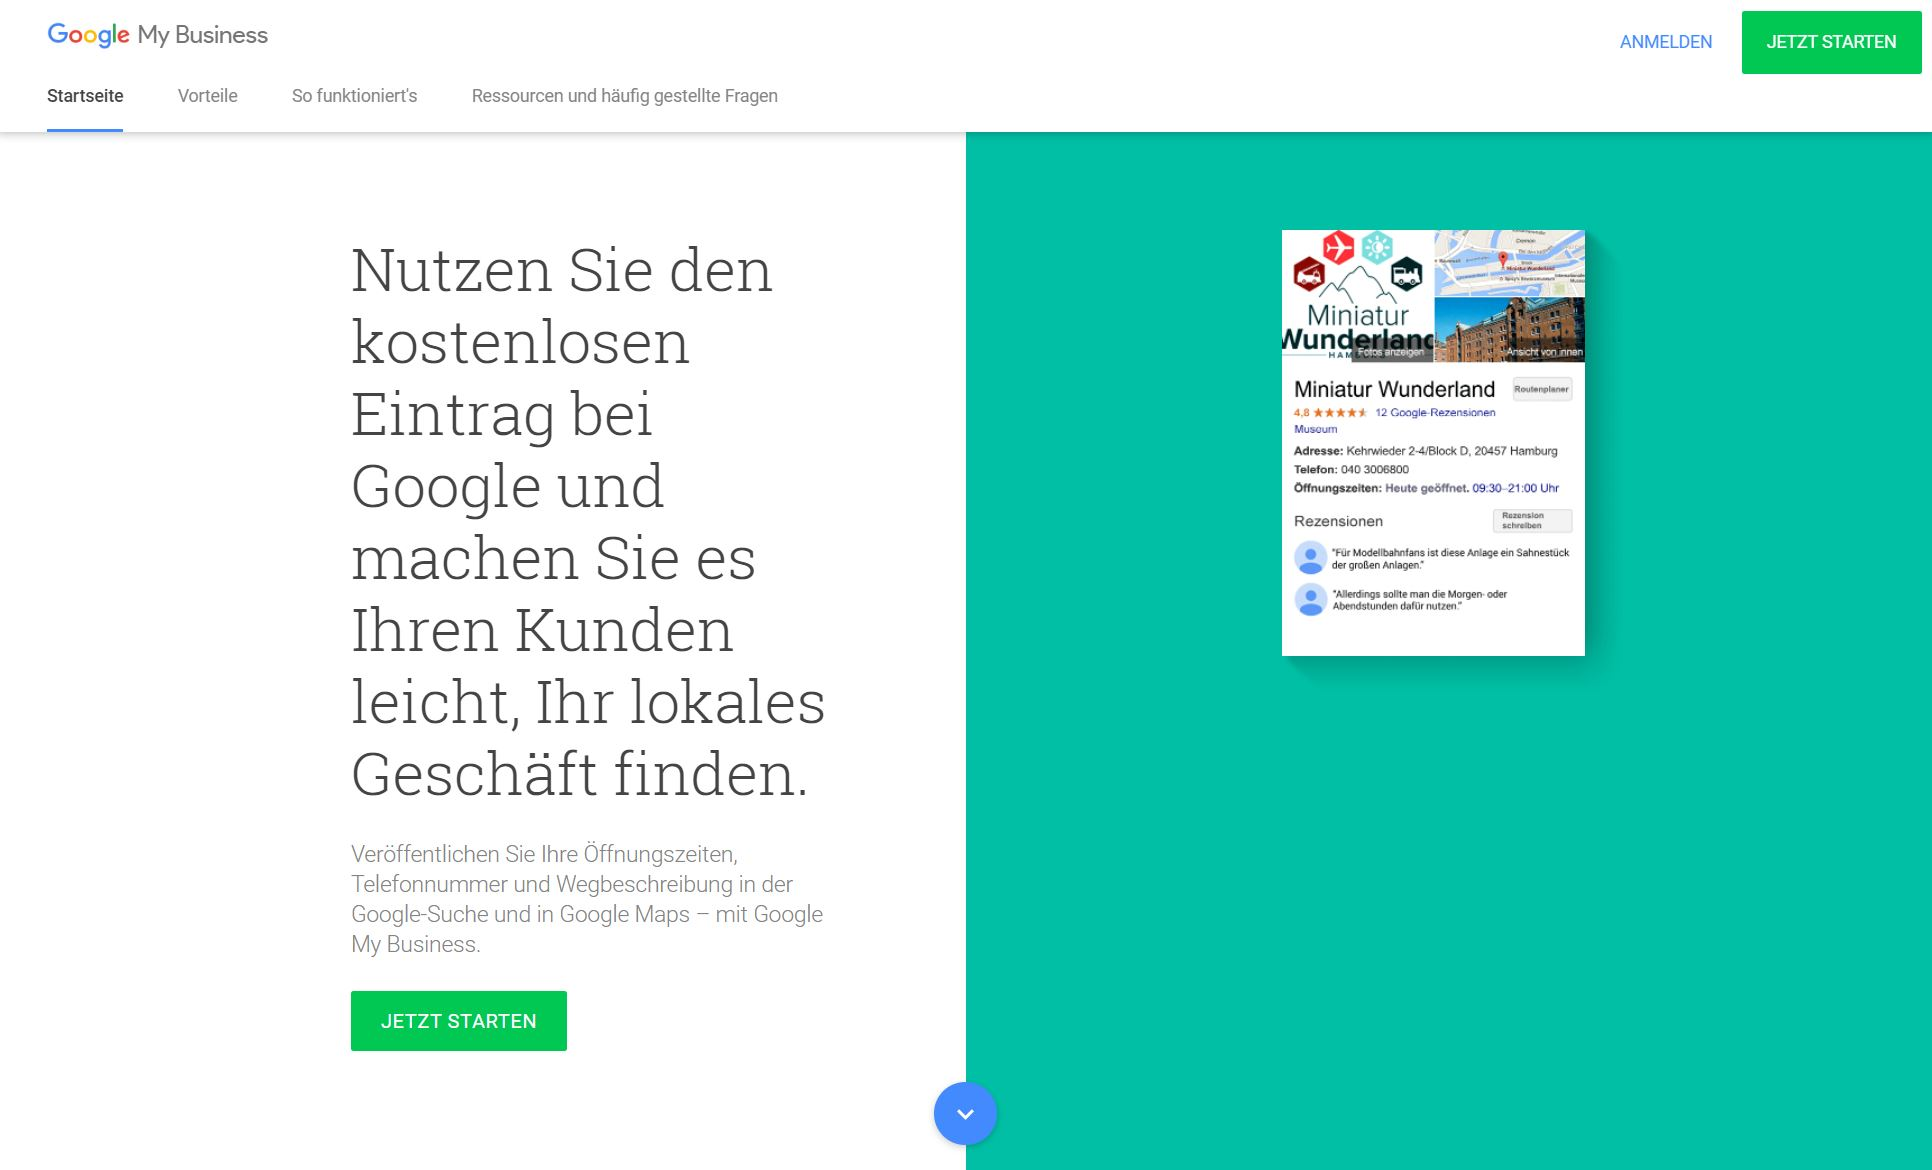 Google My Business anmelden